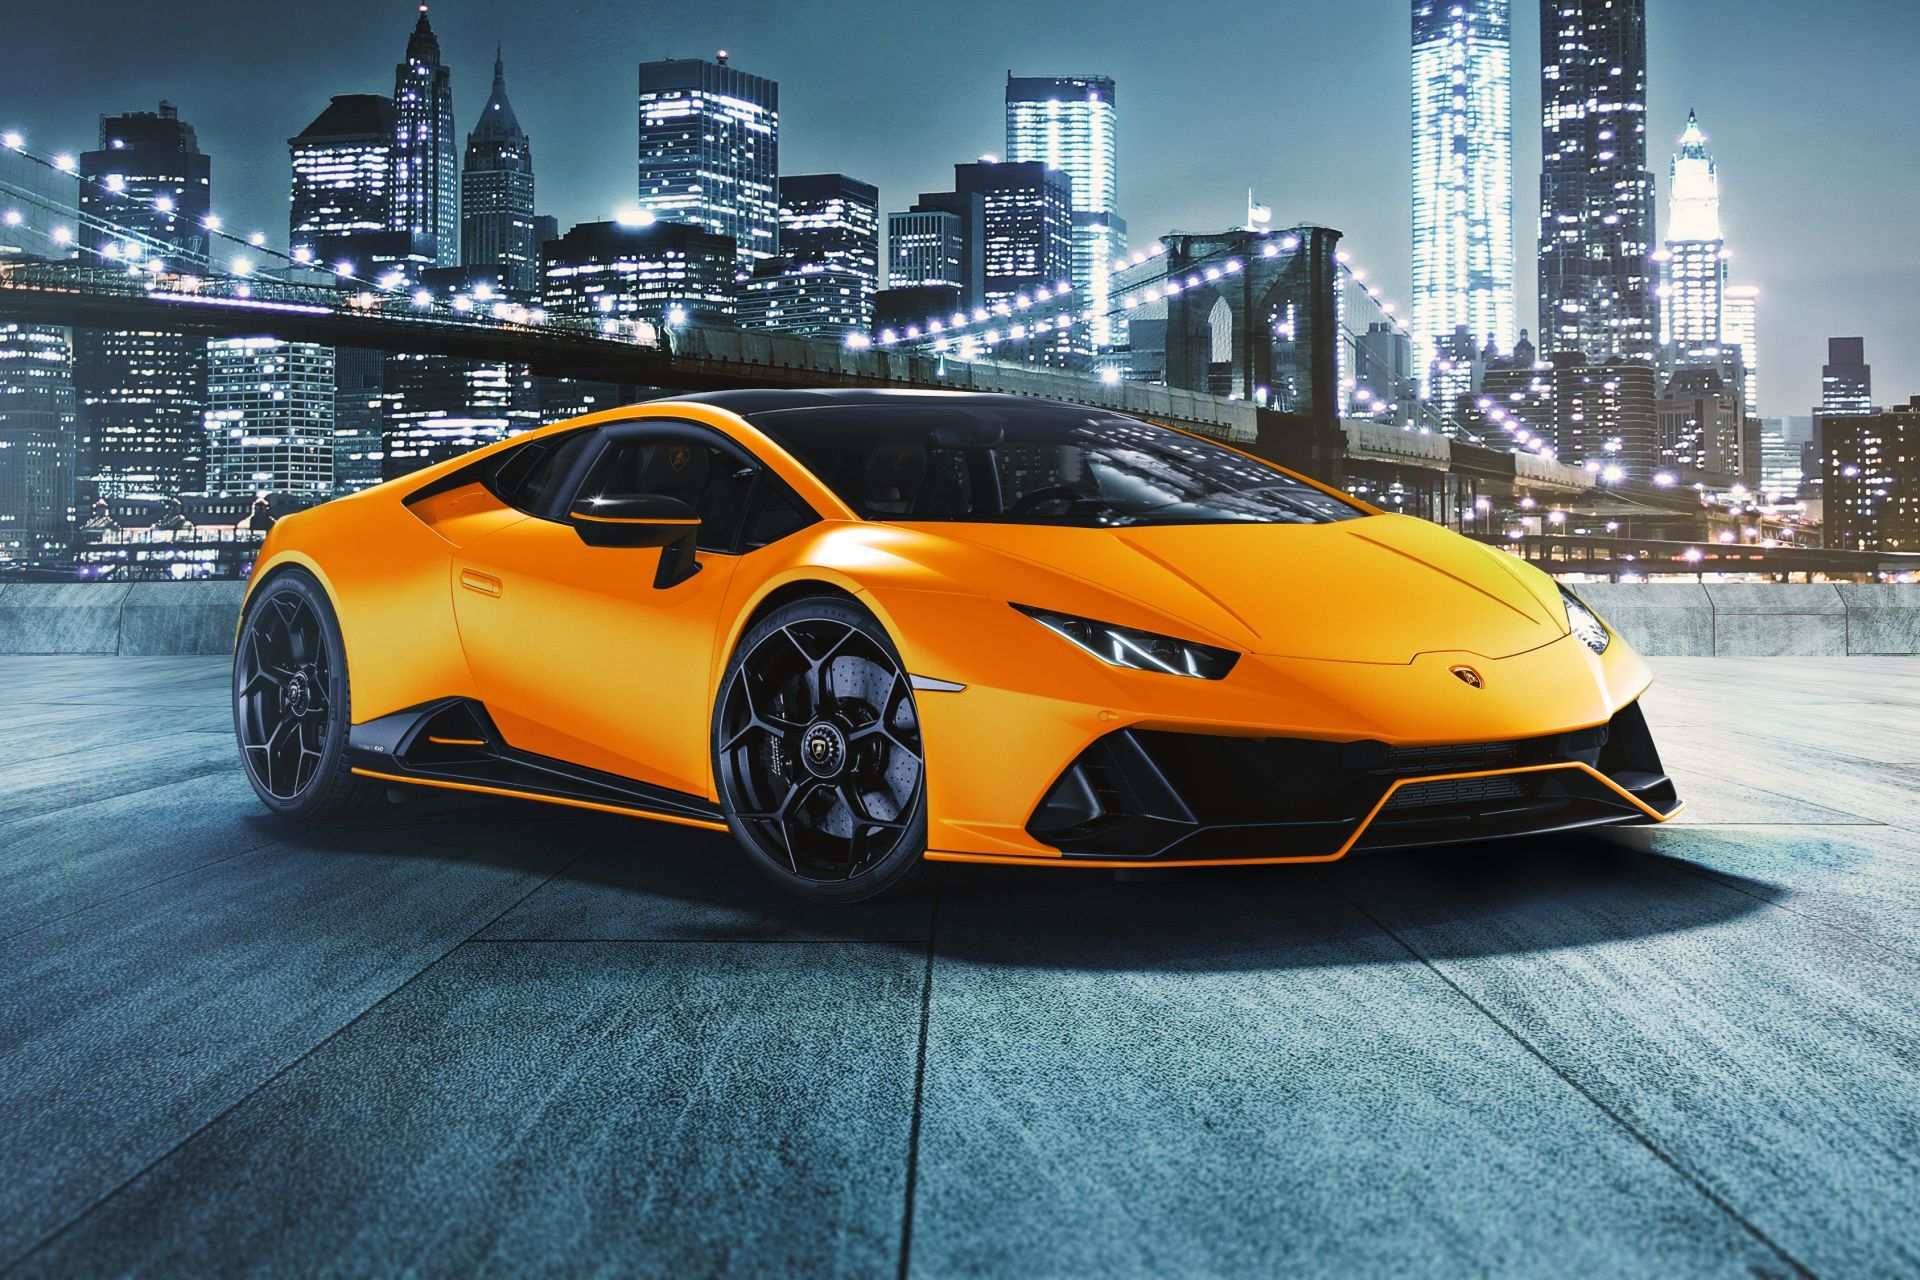 Lamborghini-Huracan-Evo-Fluo-Capsule-19